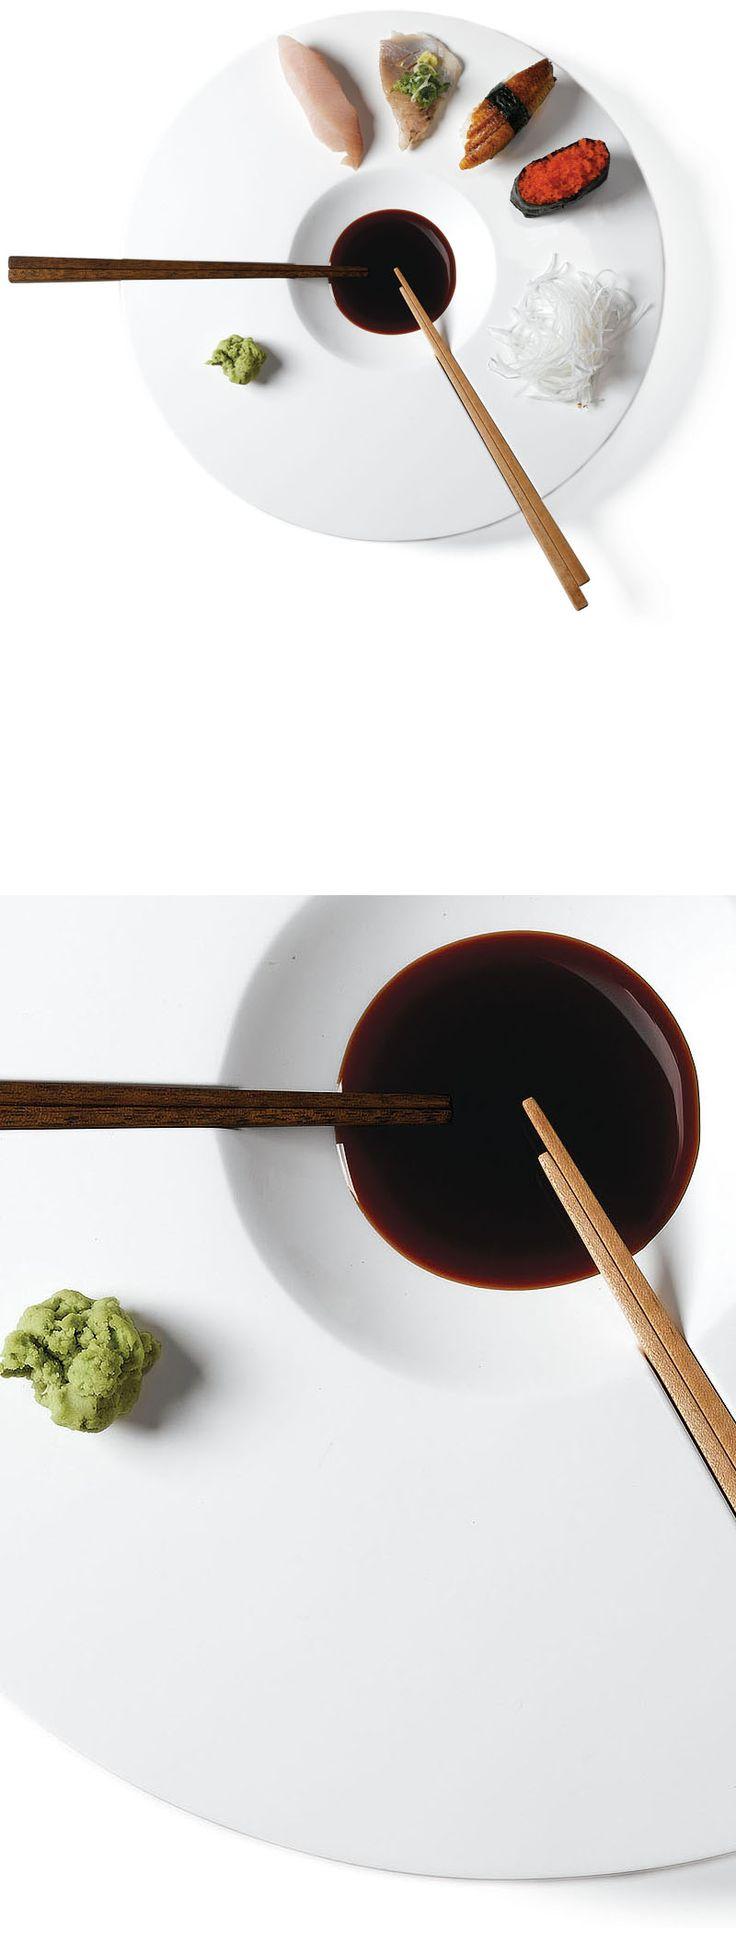 Mint Design: Sushi-Time Sushi Plate